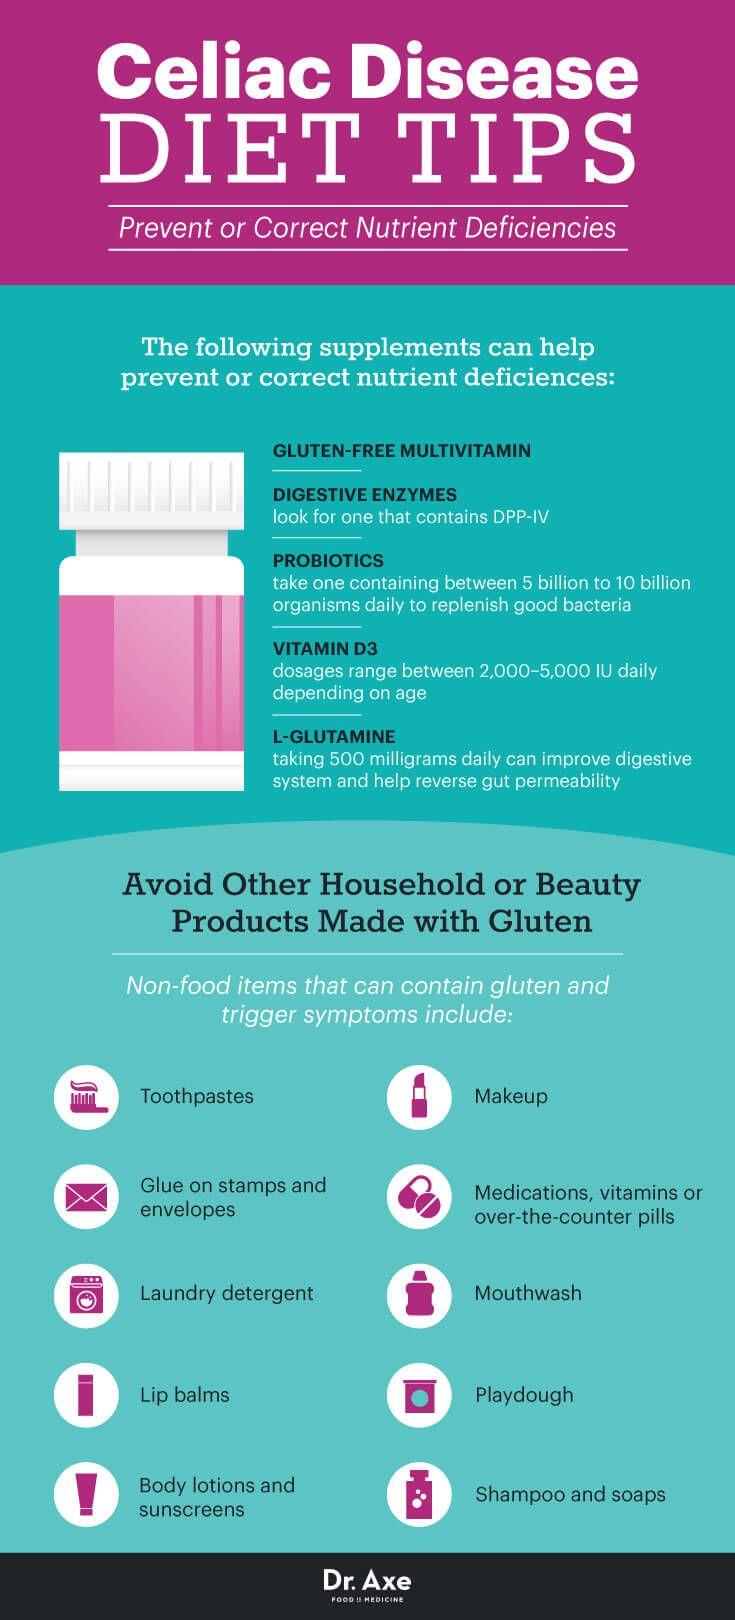 Celiac disease diet tips - Dr. Axe http://www.draxe.com #health #holistic #natural